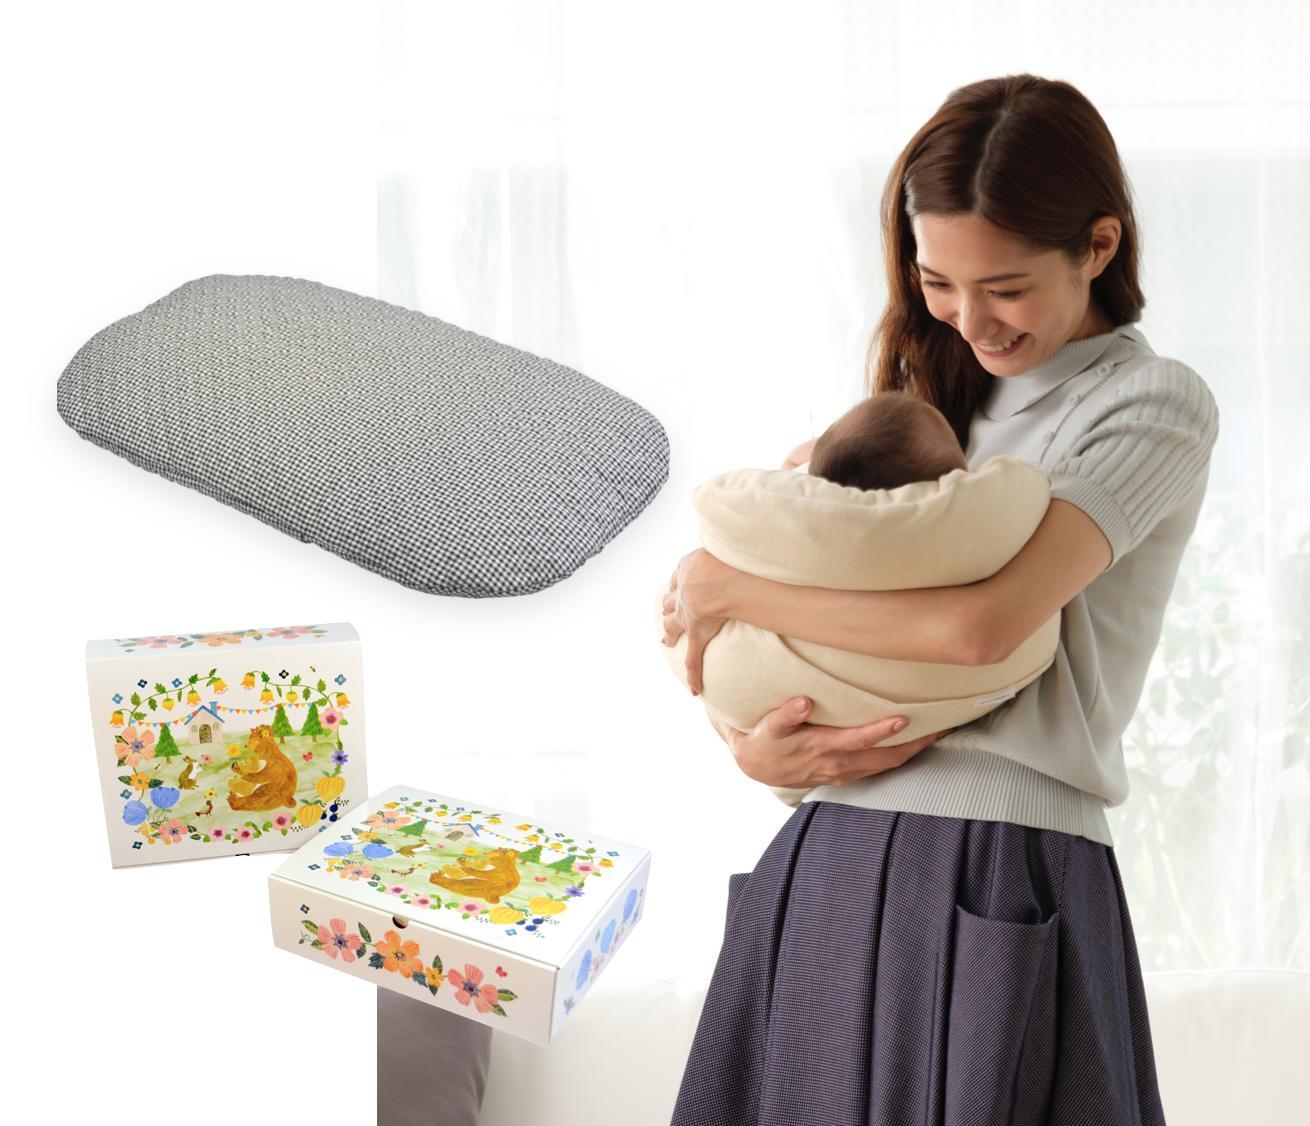 「B A N S H U - o r i 」生地カバー付き、洗える「ジョリーメゾンのトッポンチーノ(R)」デザインパッケージ付き(白黒ギンガムチェック)。新生児の抱っこ・寝かしつけに最適です。